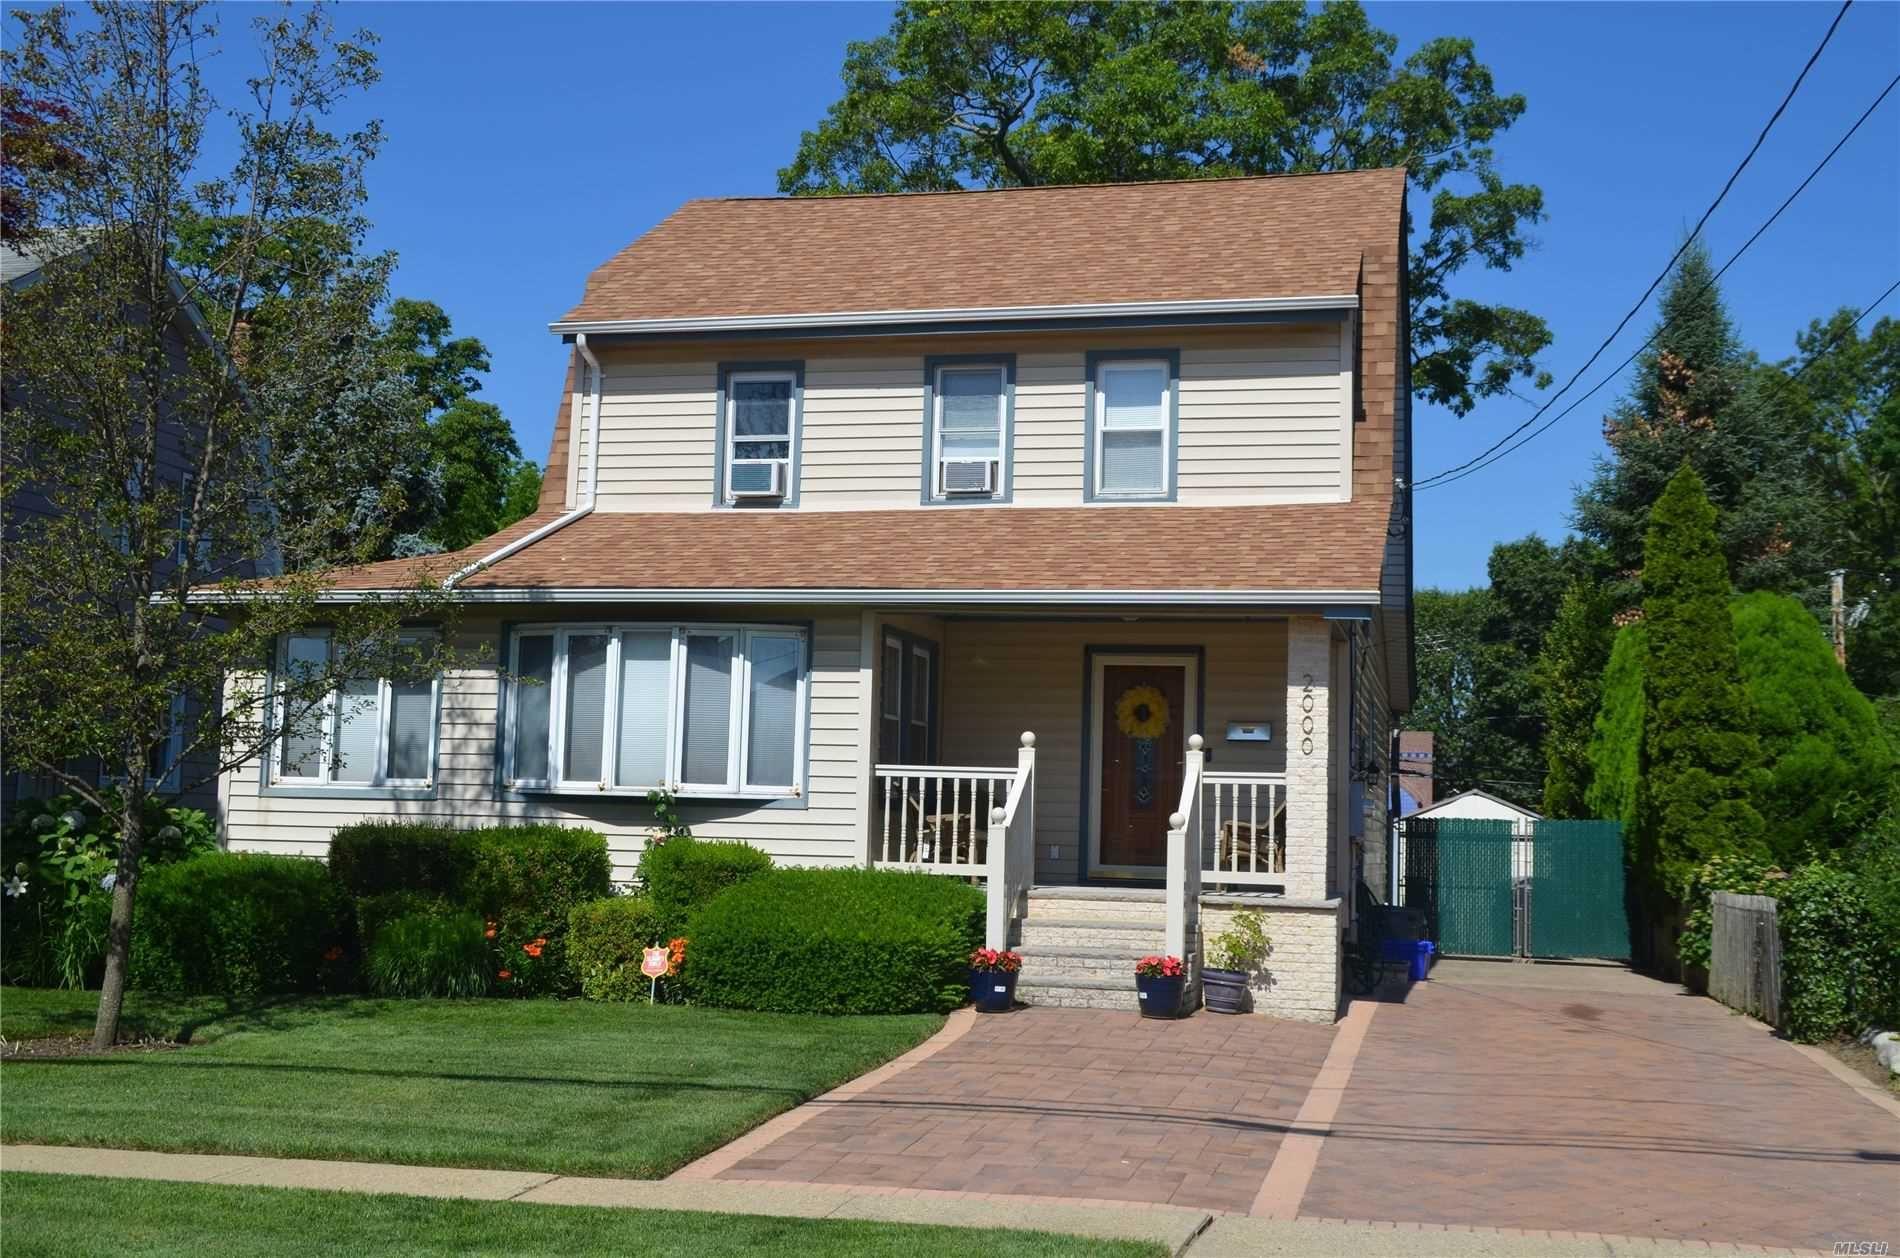 2000 Oakmere Drive, Baldwin, NY 11510 - MLS#: 3225947